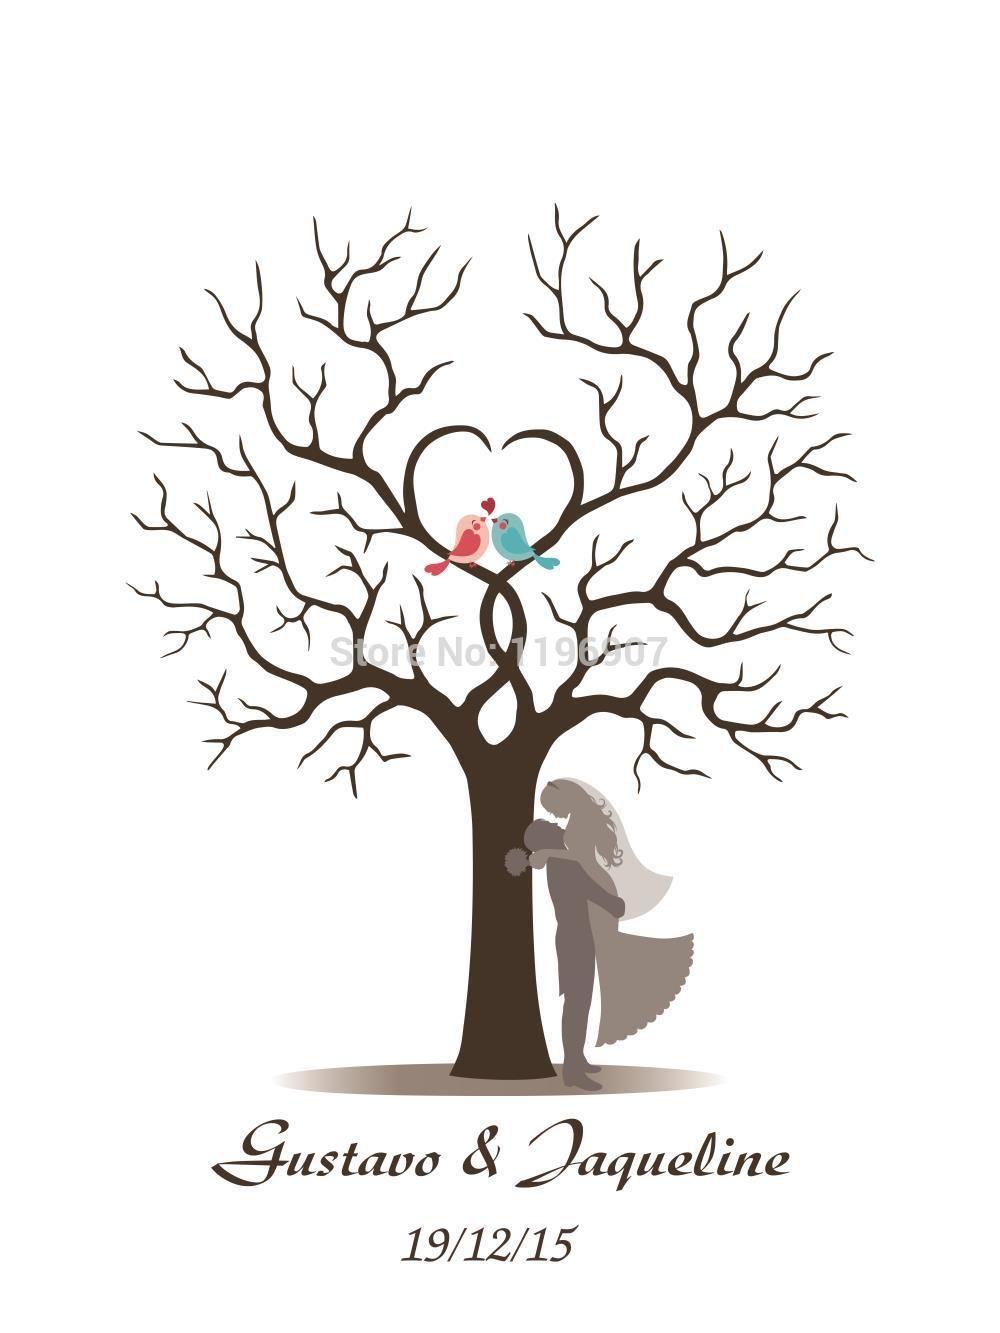 40x60CM Customized Wedding Fingerprint Tree Guestbook Alternative ...